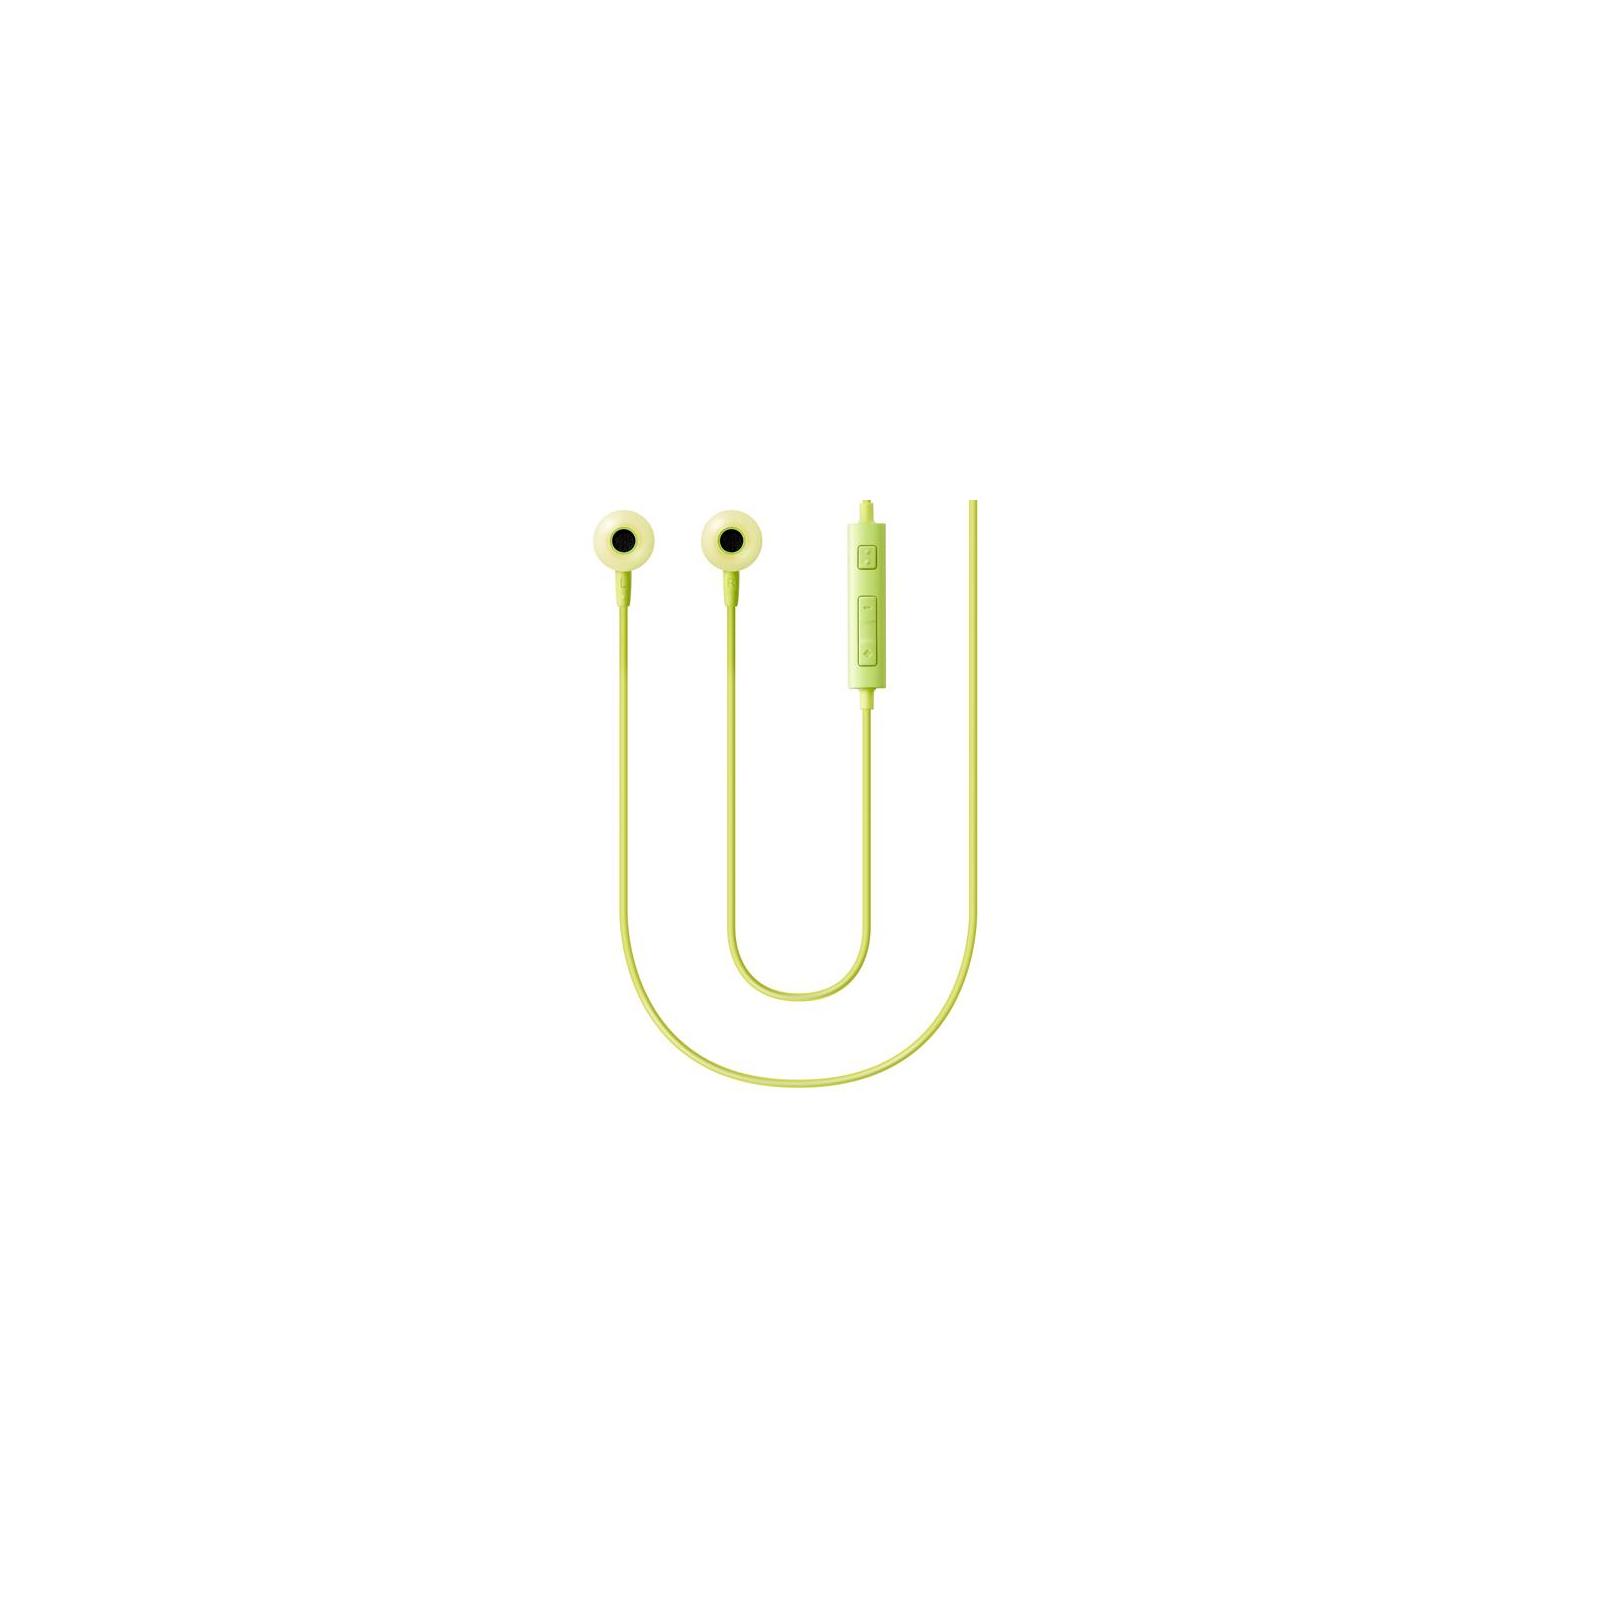 Наушники Samsung Wired Green (EO-HS1303GEGRU) изображение 5